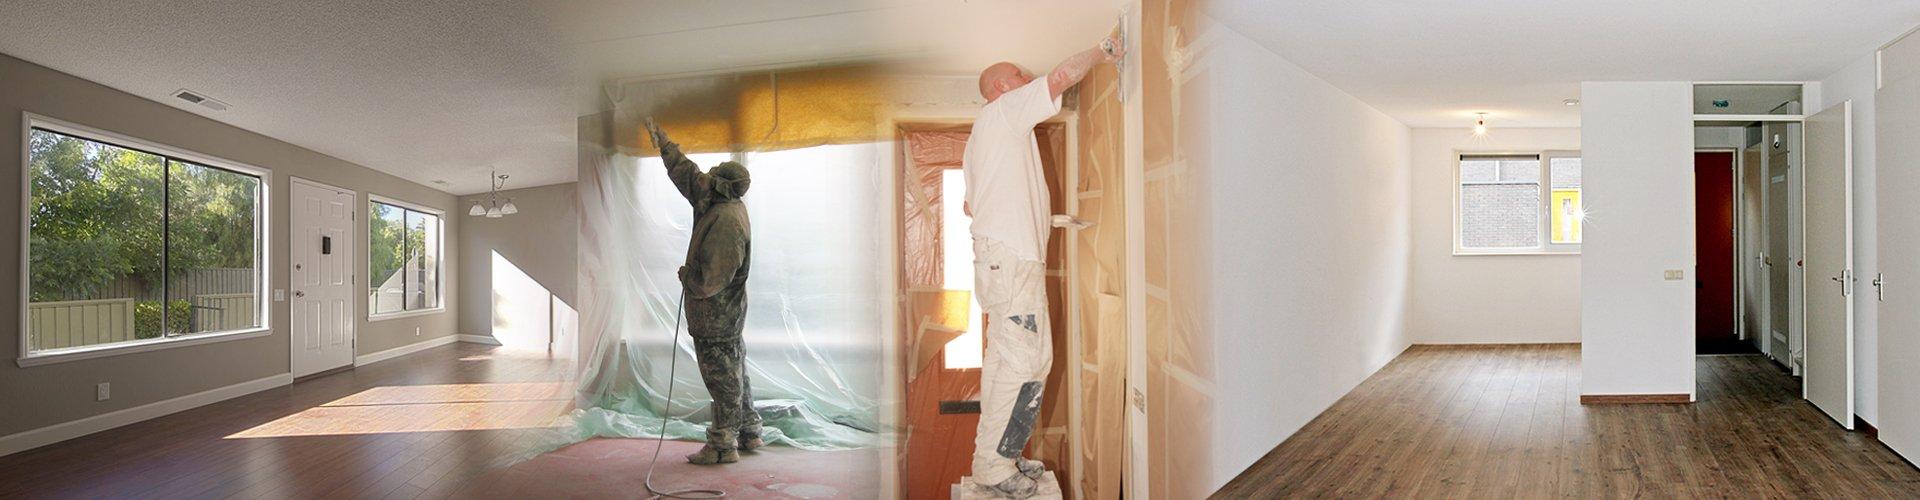 muur verven en plafond verven